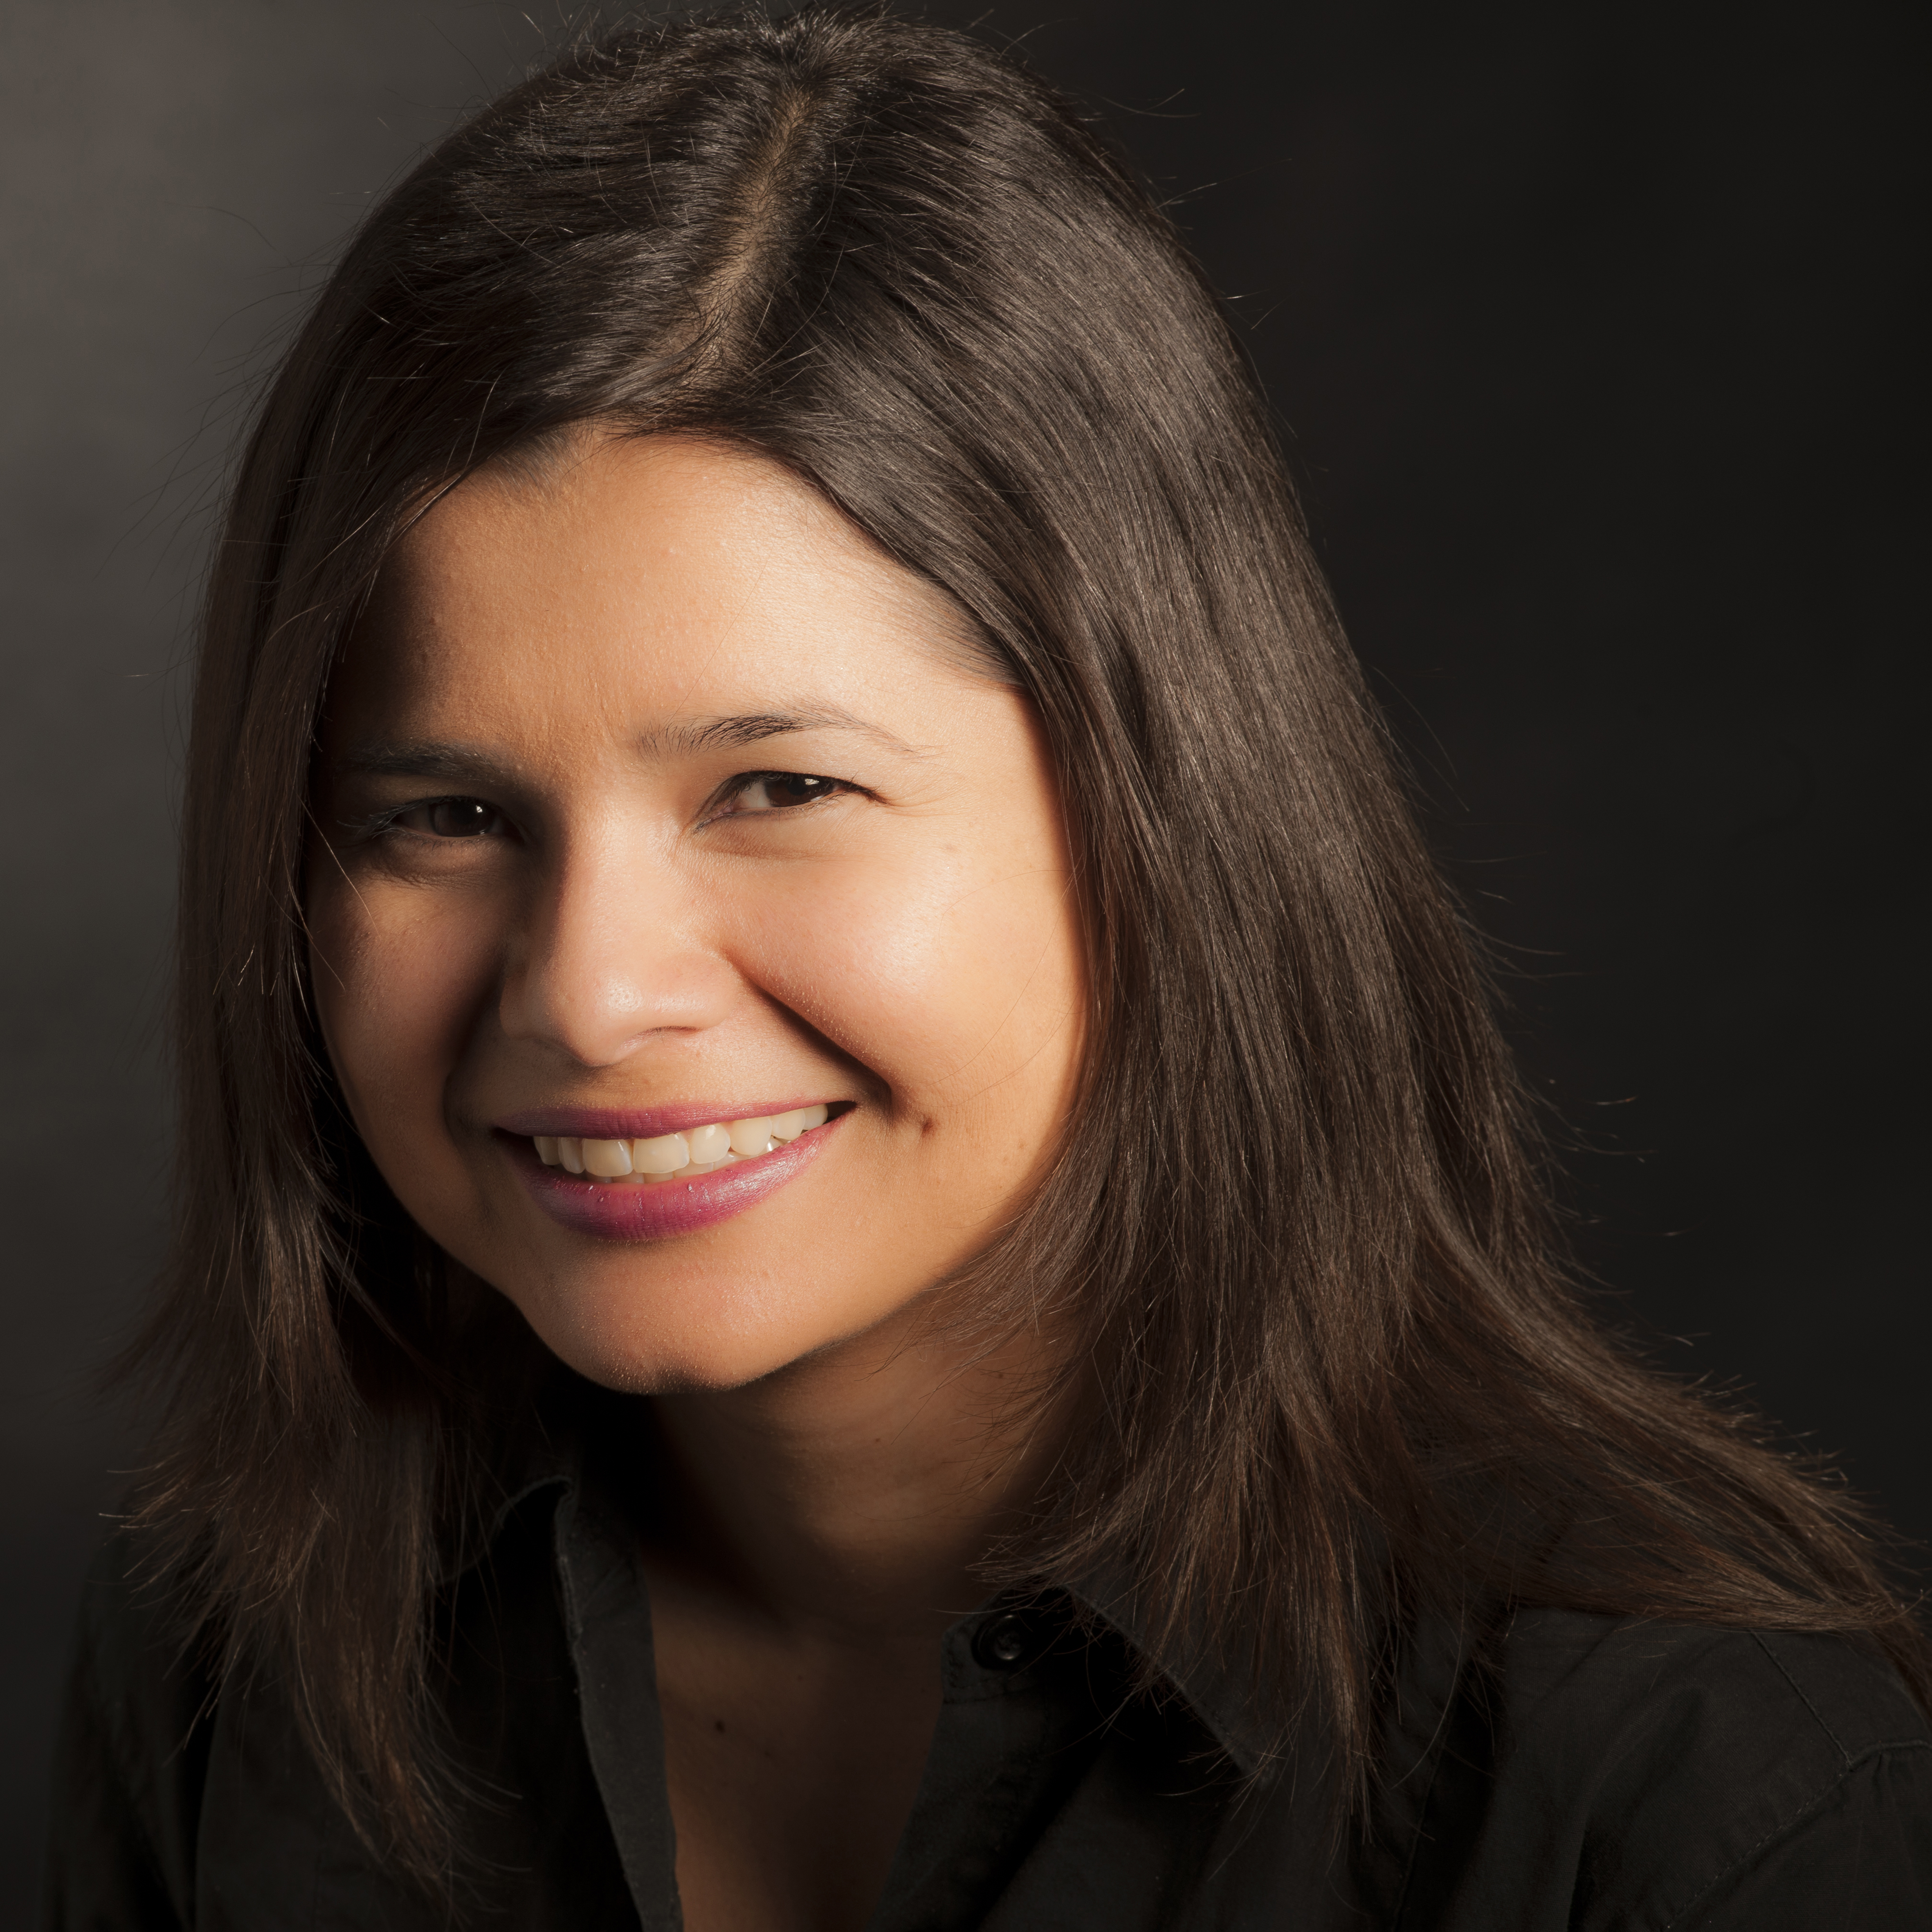 Aleyda Solis profile picture